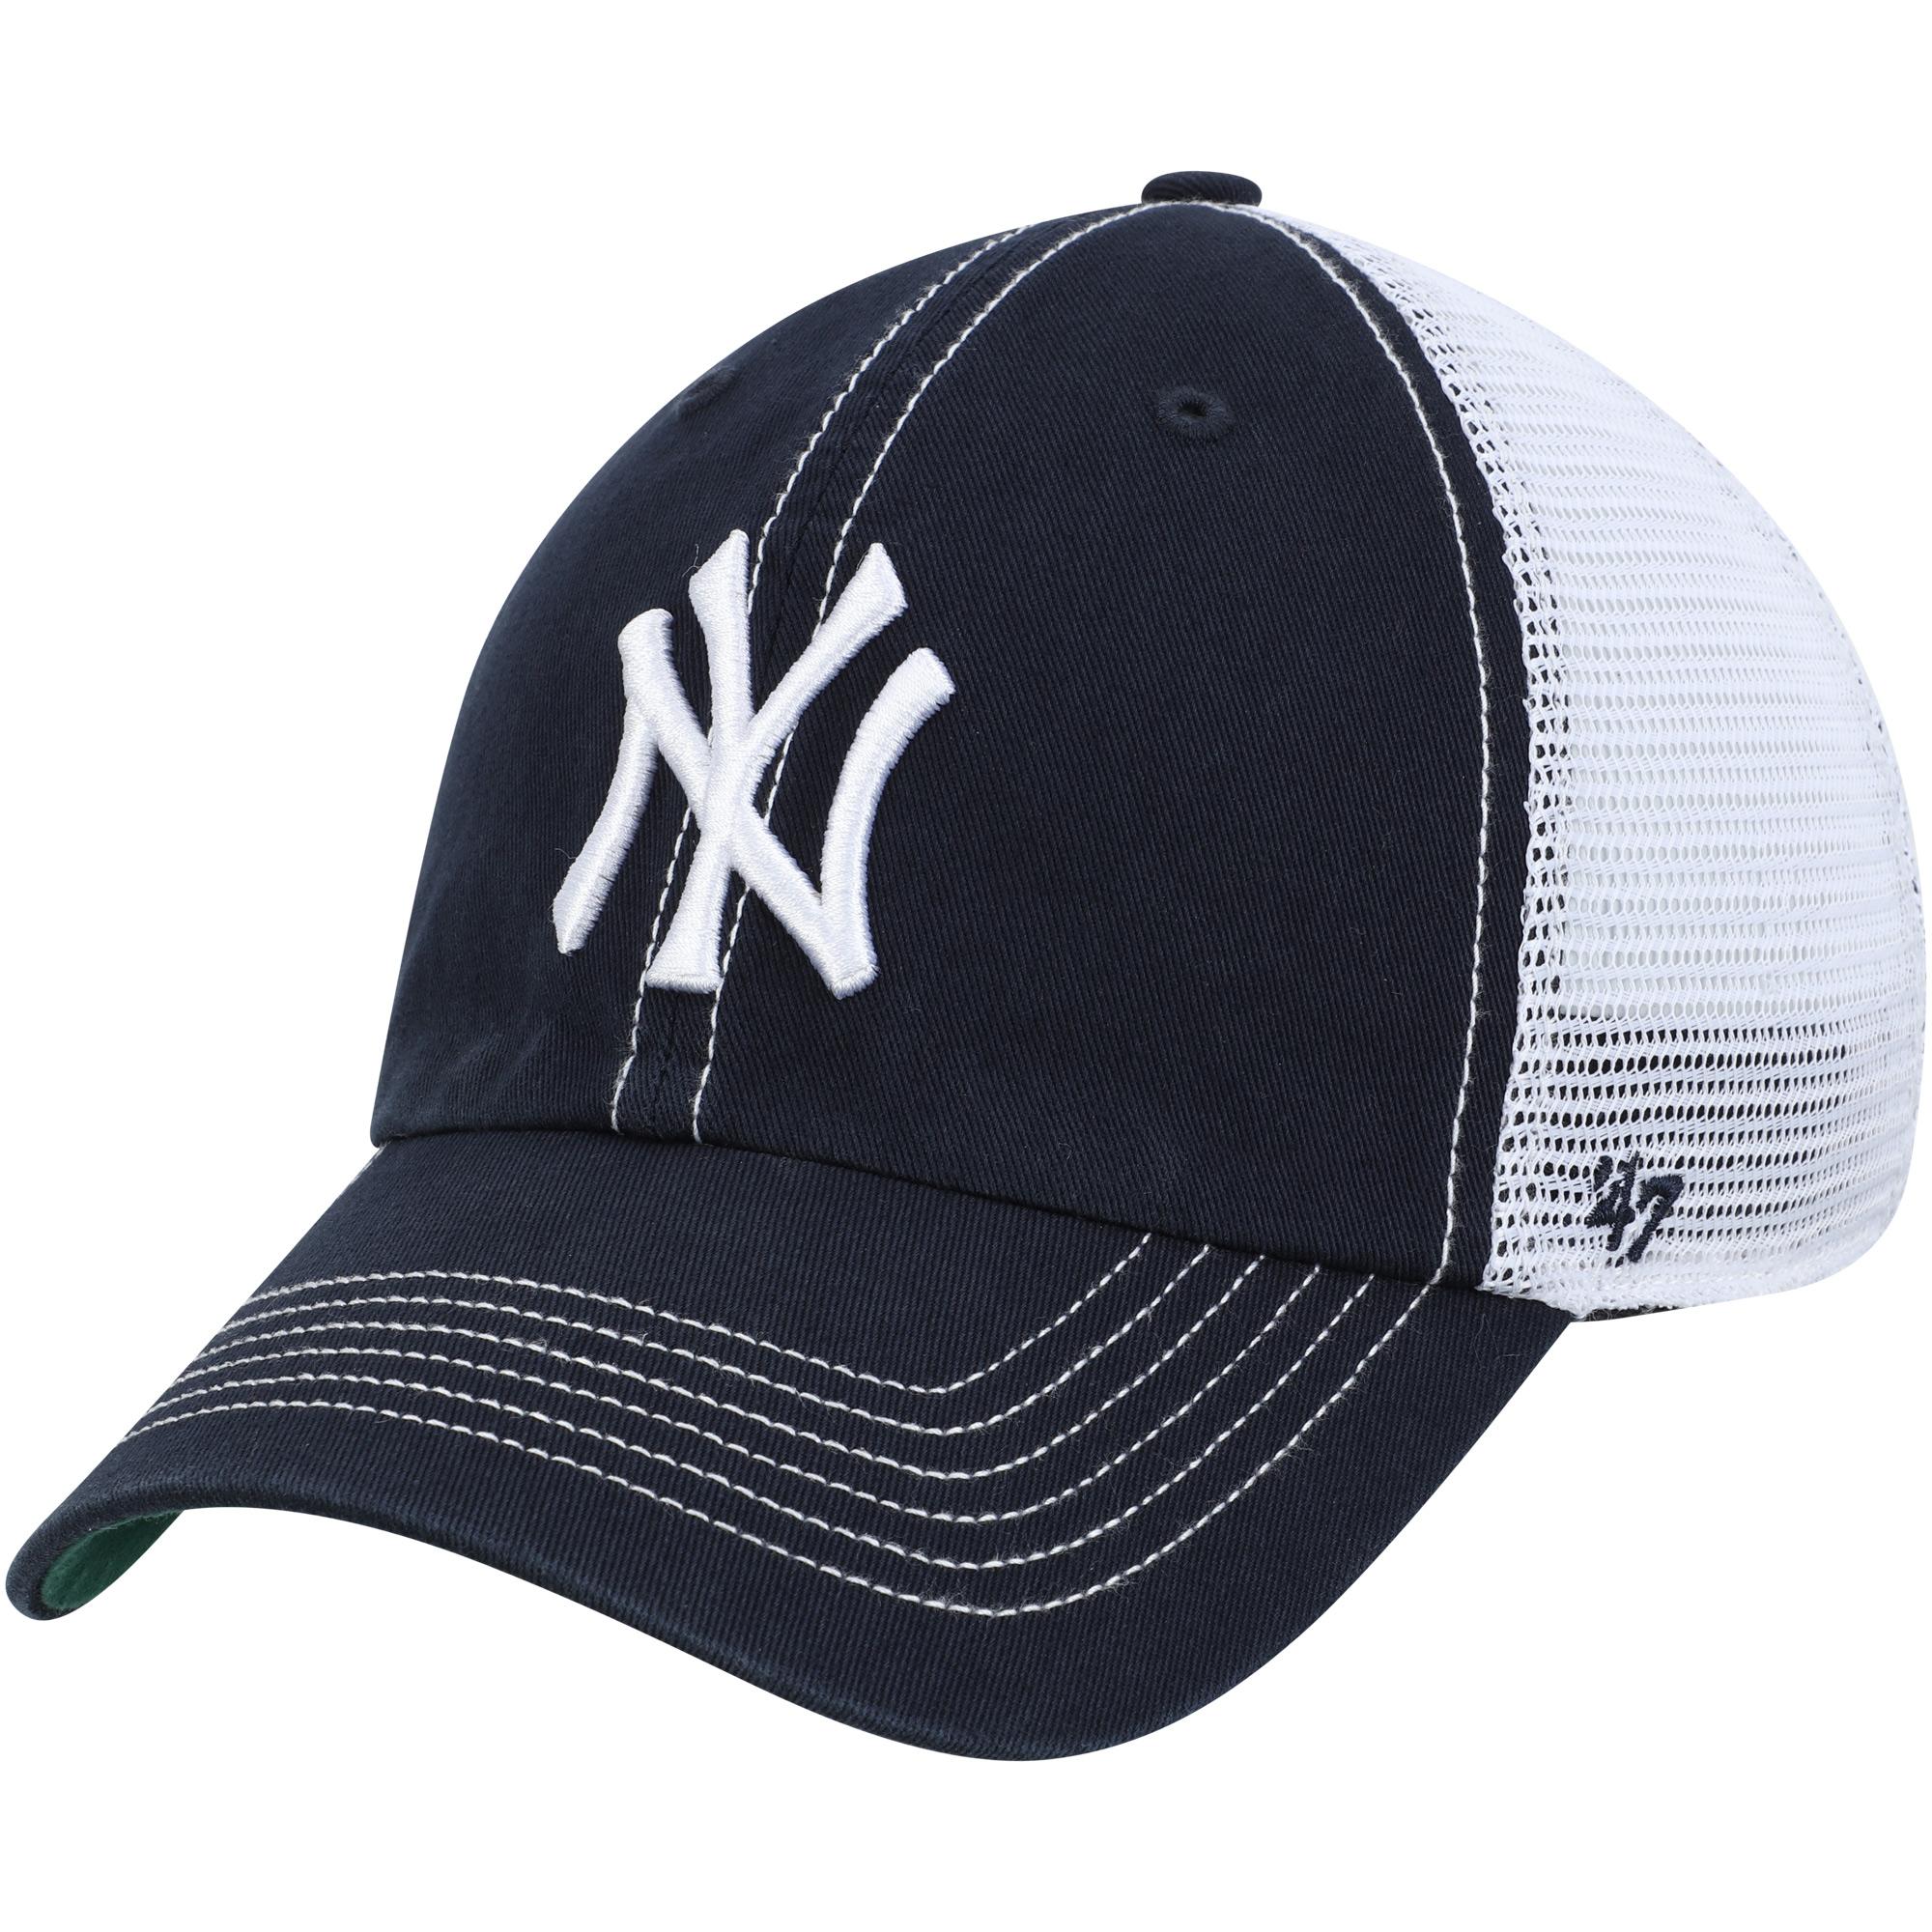 New York Yankees '47 Trawler Clean Up Trucker Hat - Navy - OSFA